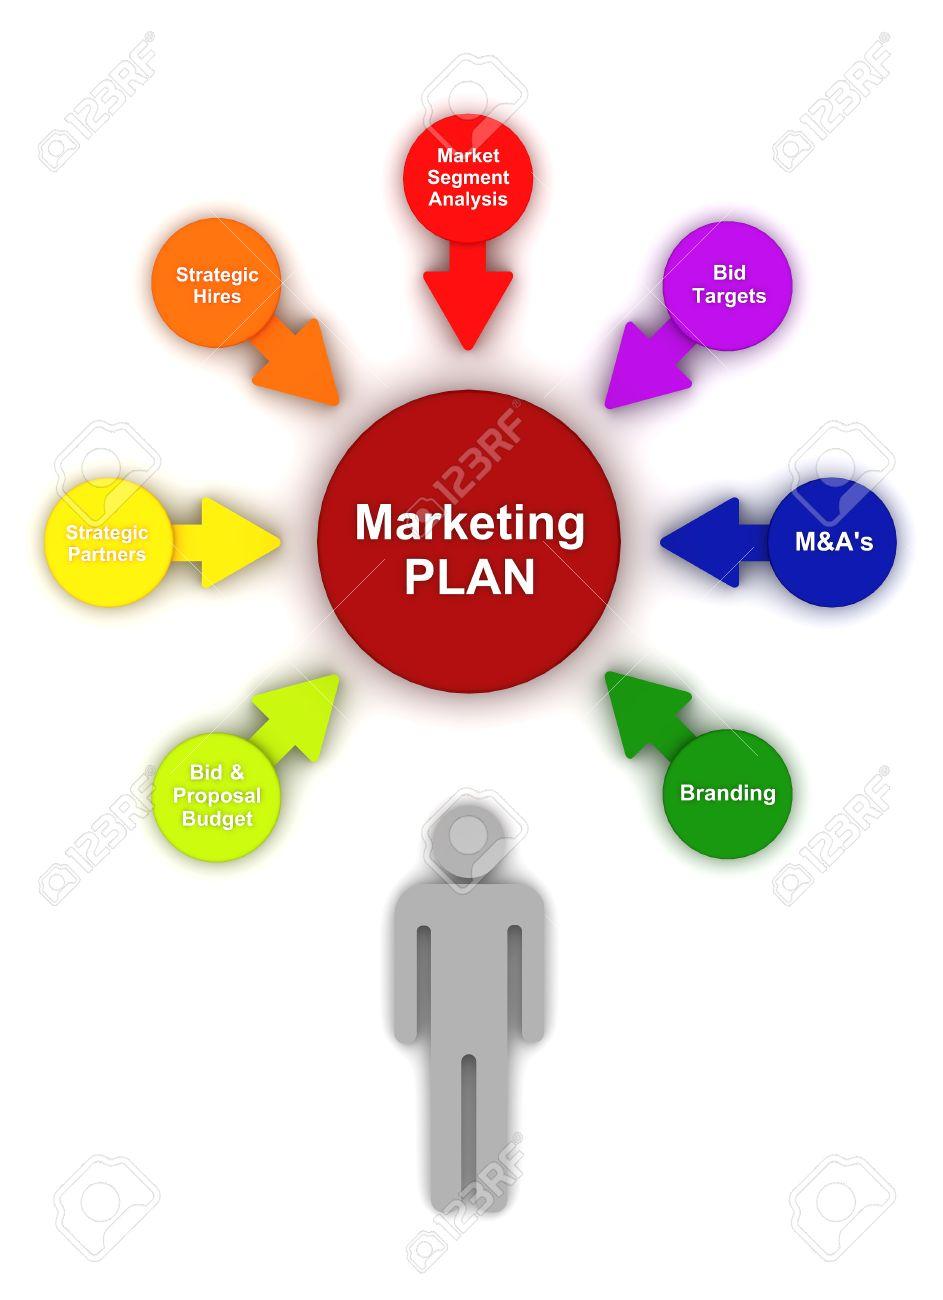 Marketing plan 3d render circle bubble chart diagram business marketing plan 3d render circle bubble chart diagram business color stock photo 23427048 nvjuhfo Images